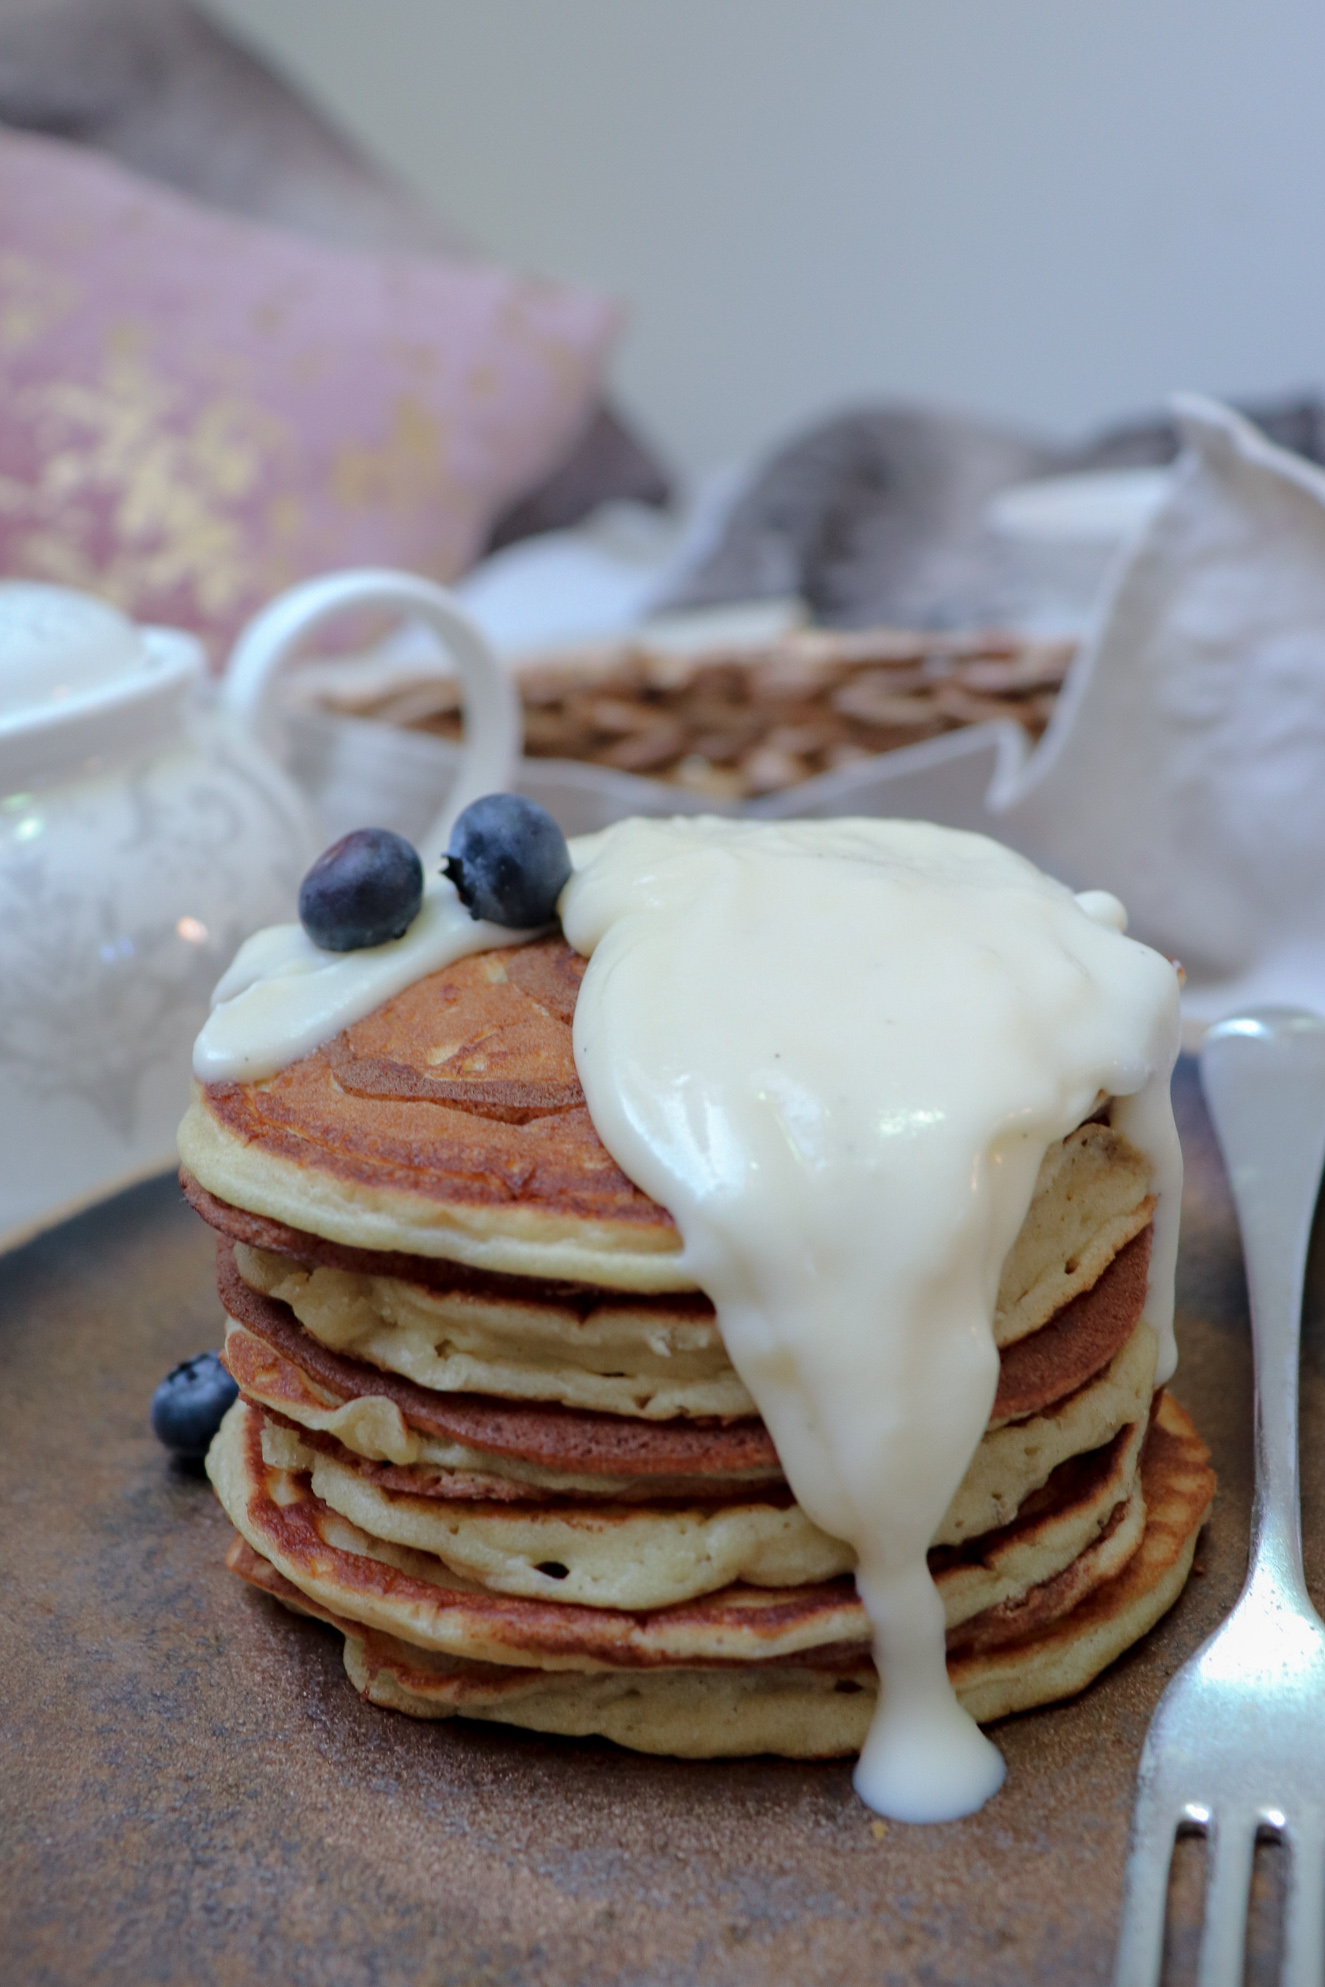 Breakfast in Bed by Martha Collison | Laura Ashley Blog